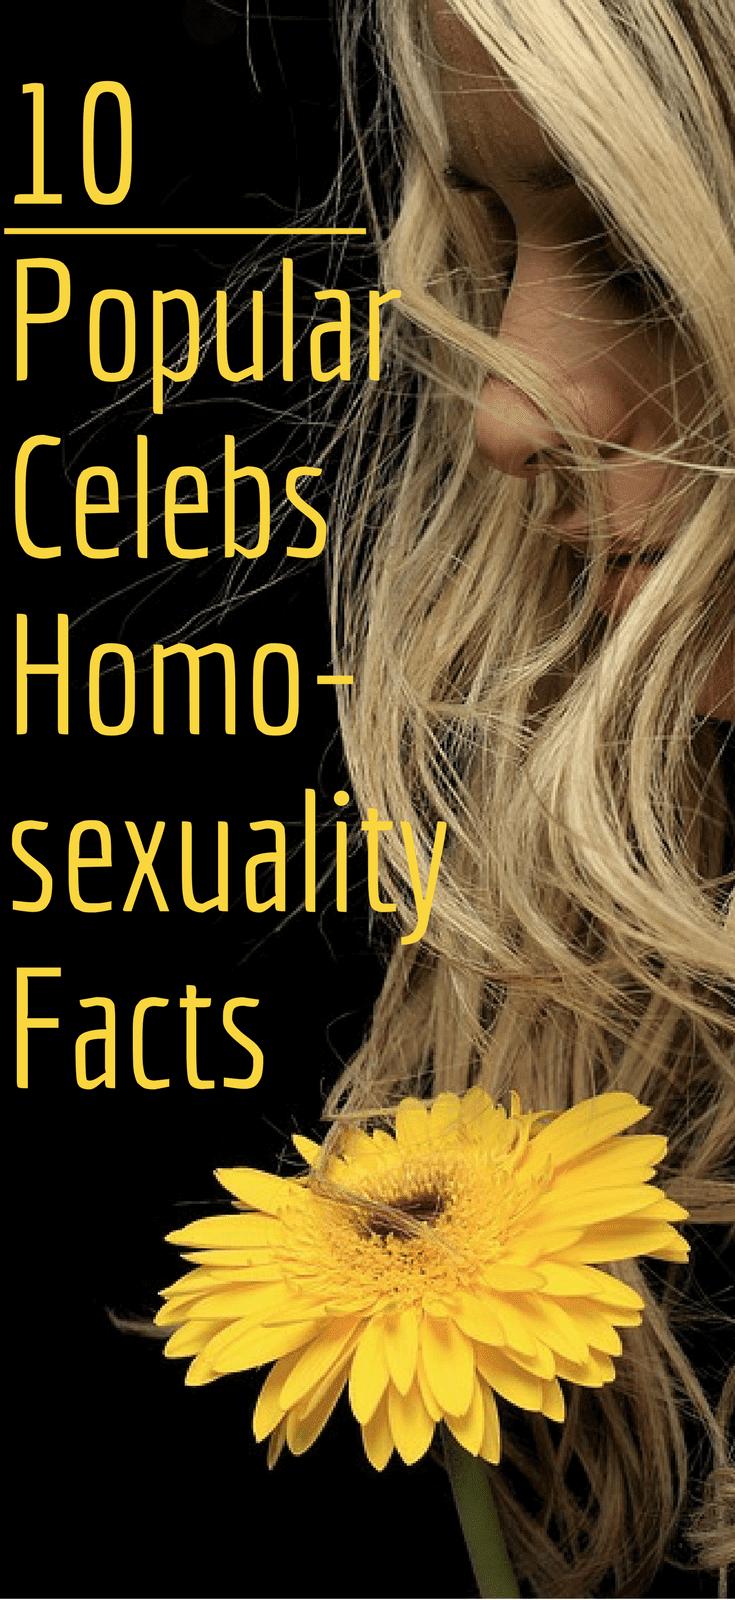 10 Popular Celebrities Homosexuality Facts